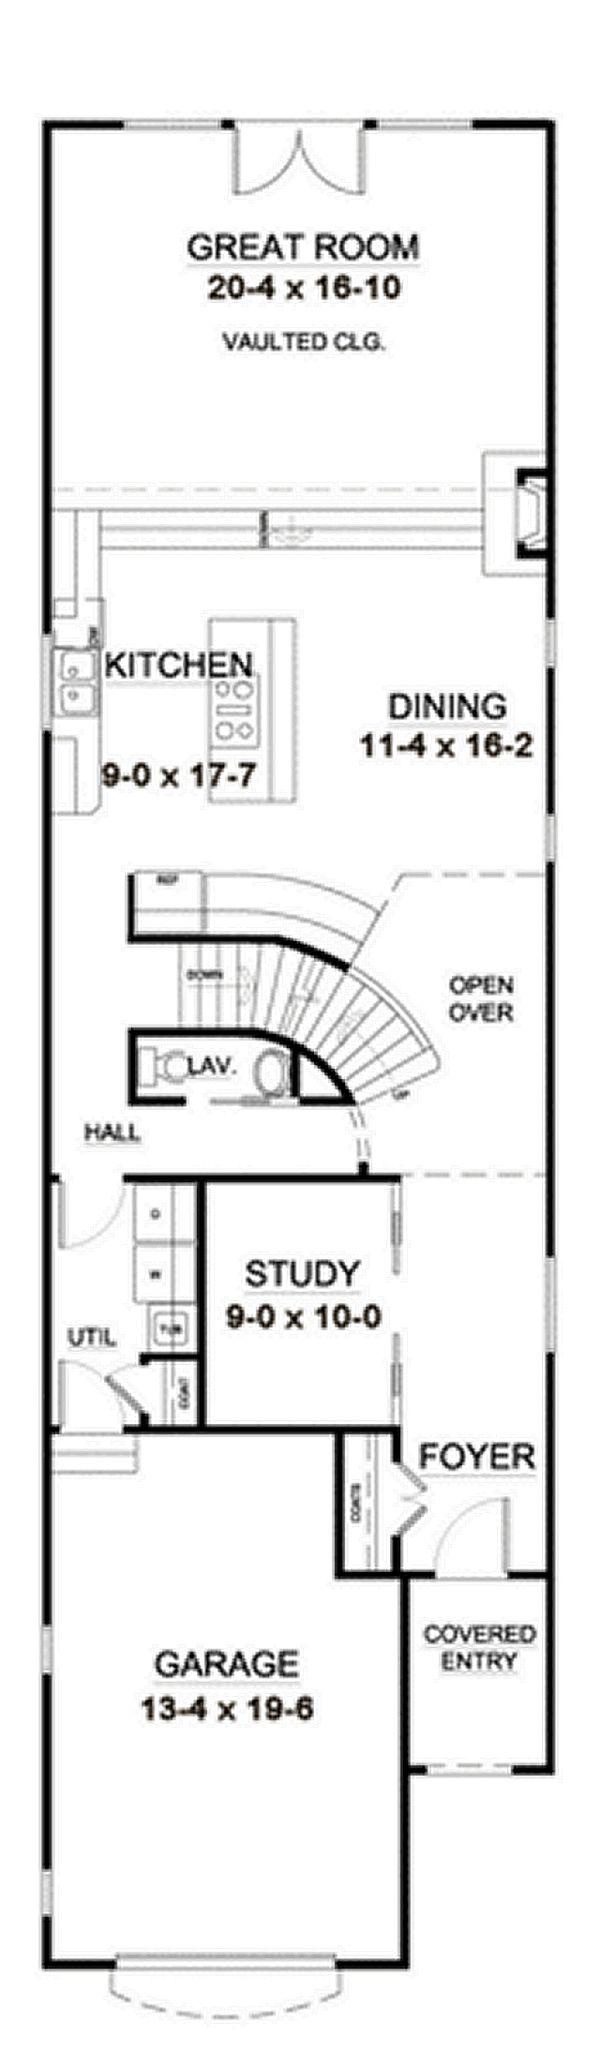 Dream House Plan - European Floor Plan - Main Floor Plan #126-227